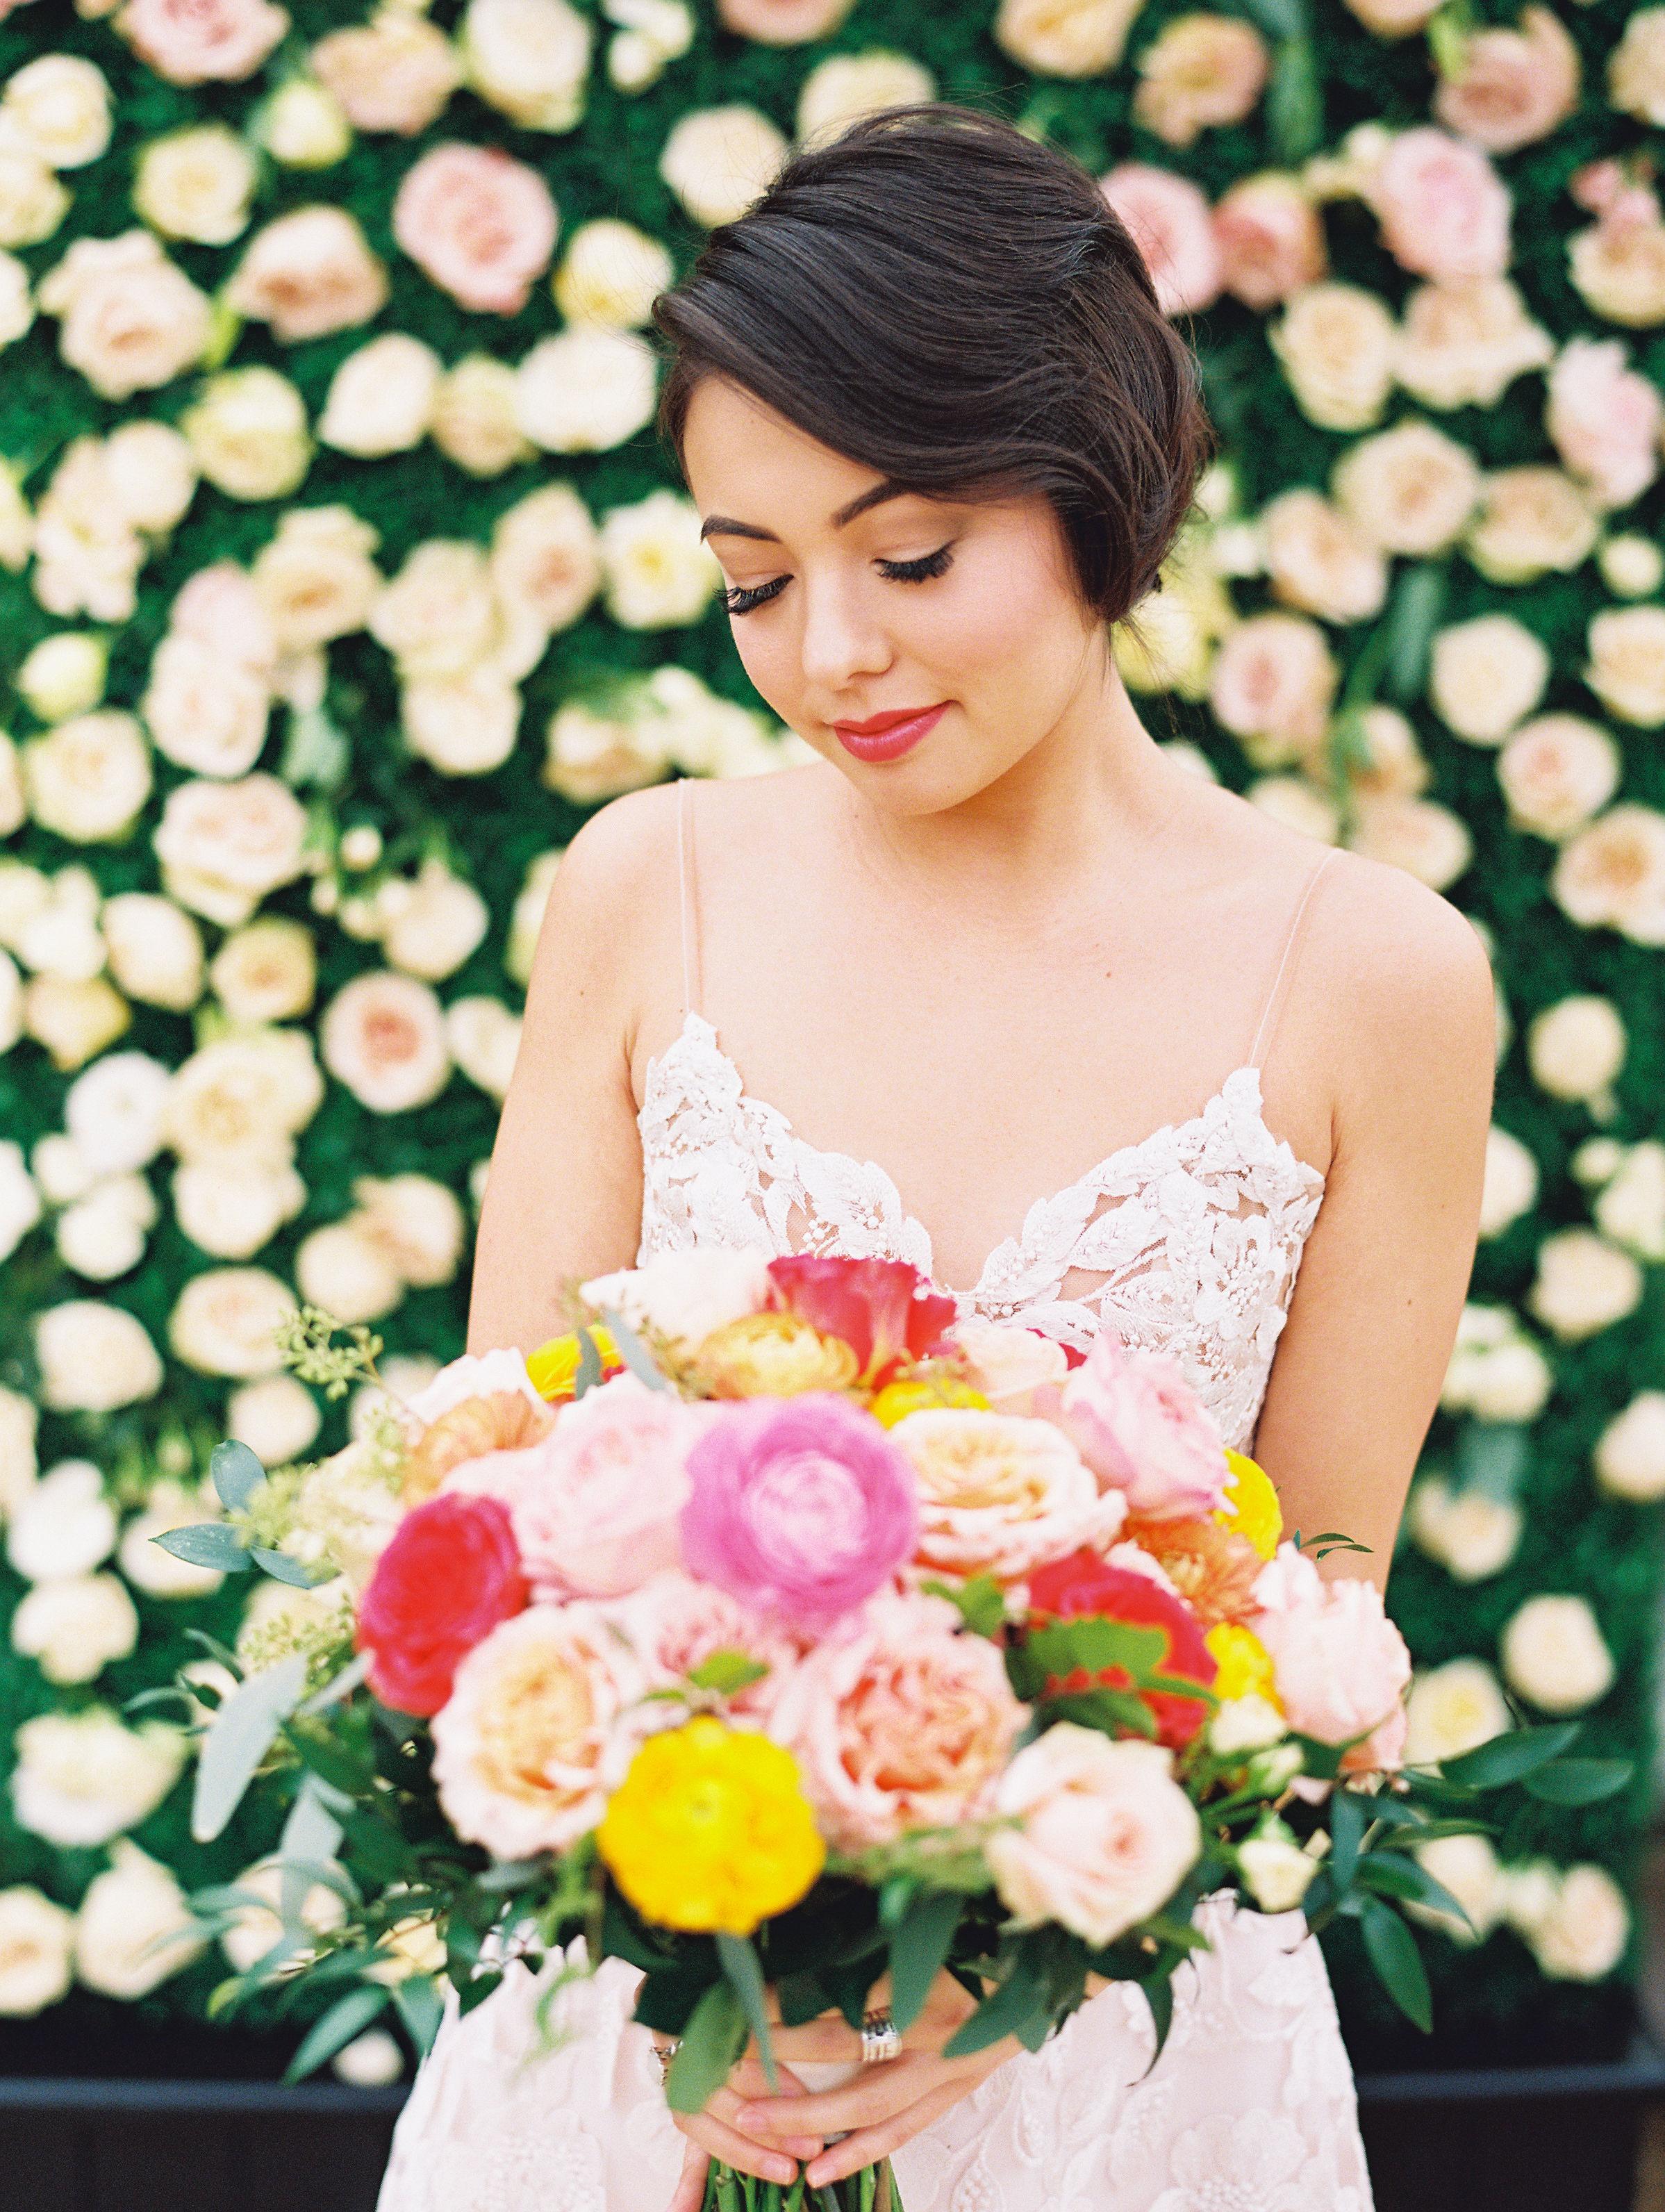 MOD LUX WEDDINGS • DEC '18 • PRINT